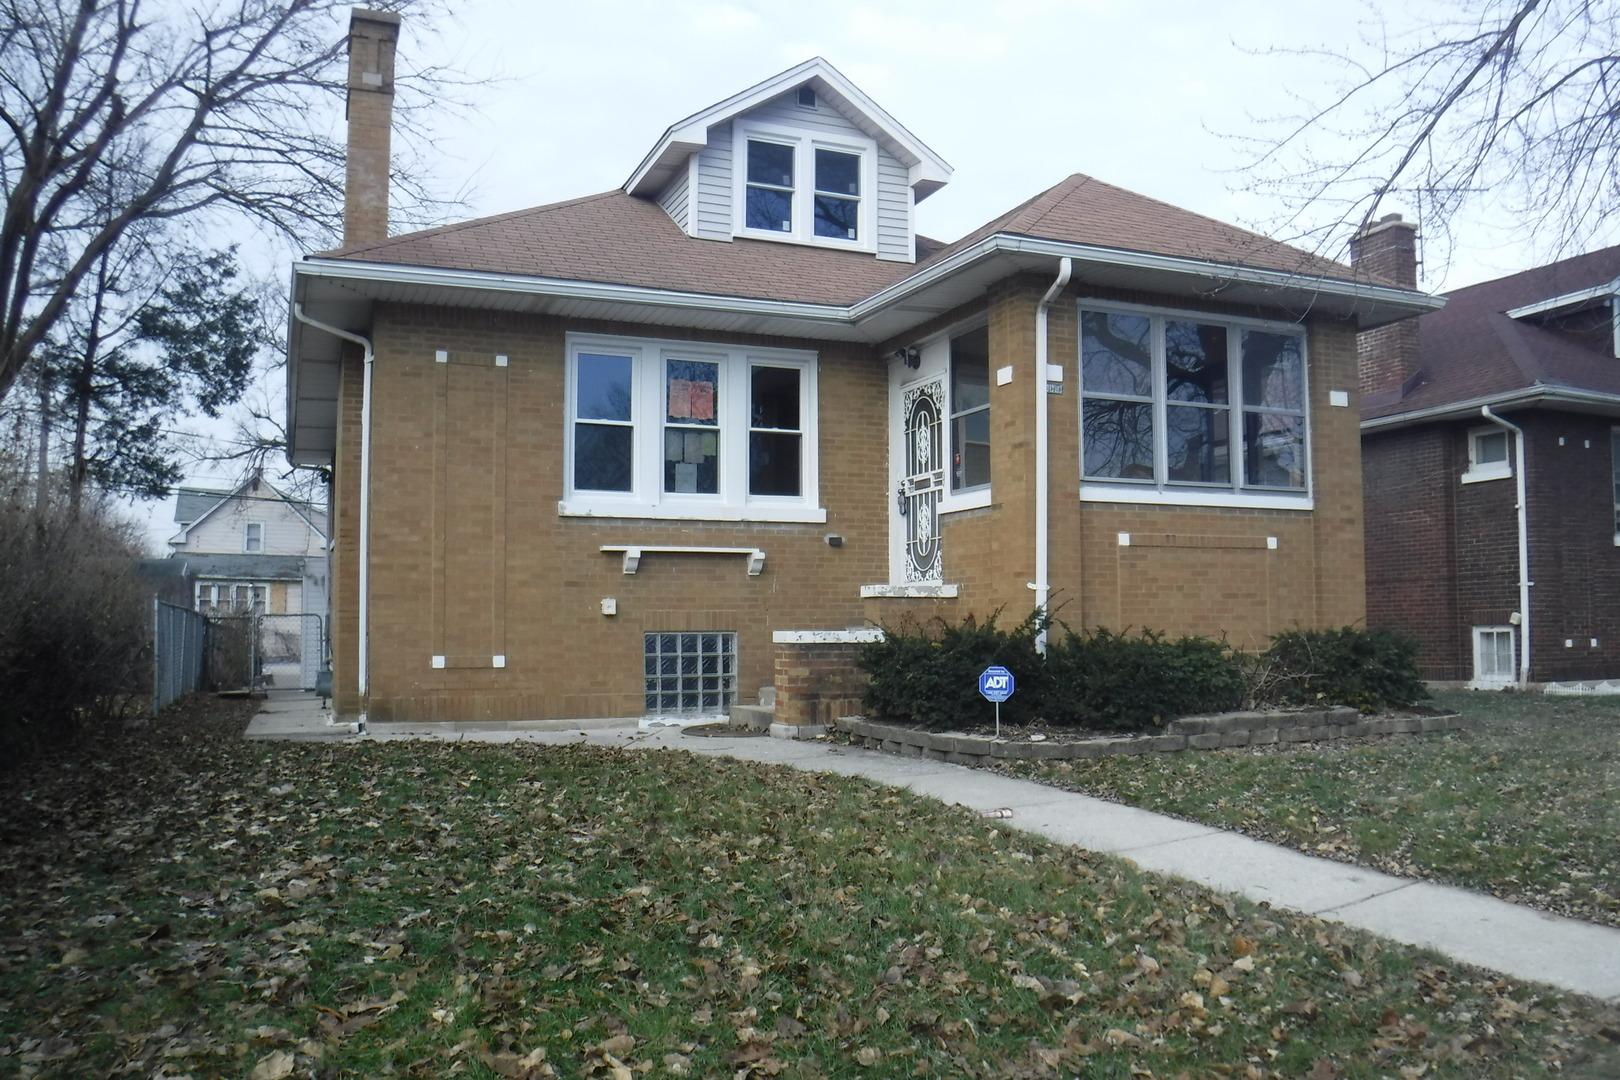 808 9th ,Maywood, Illinois 60153